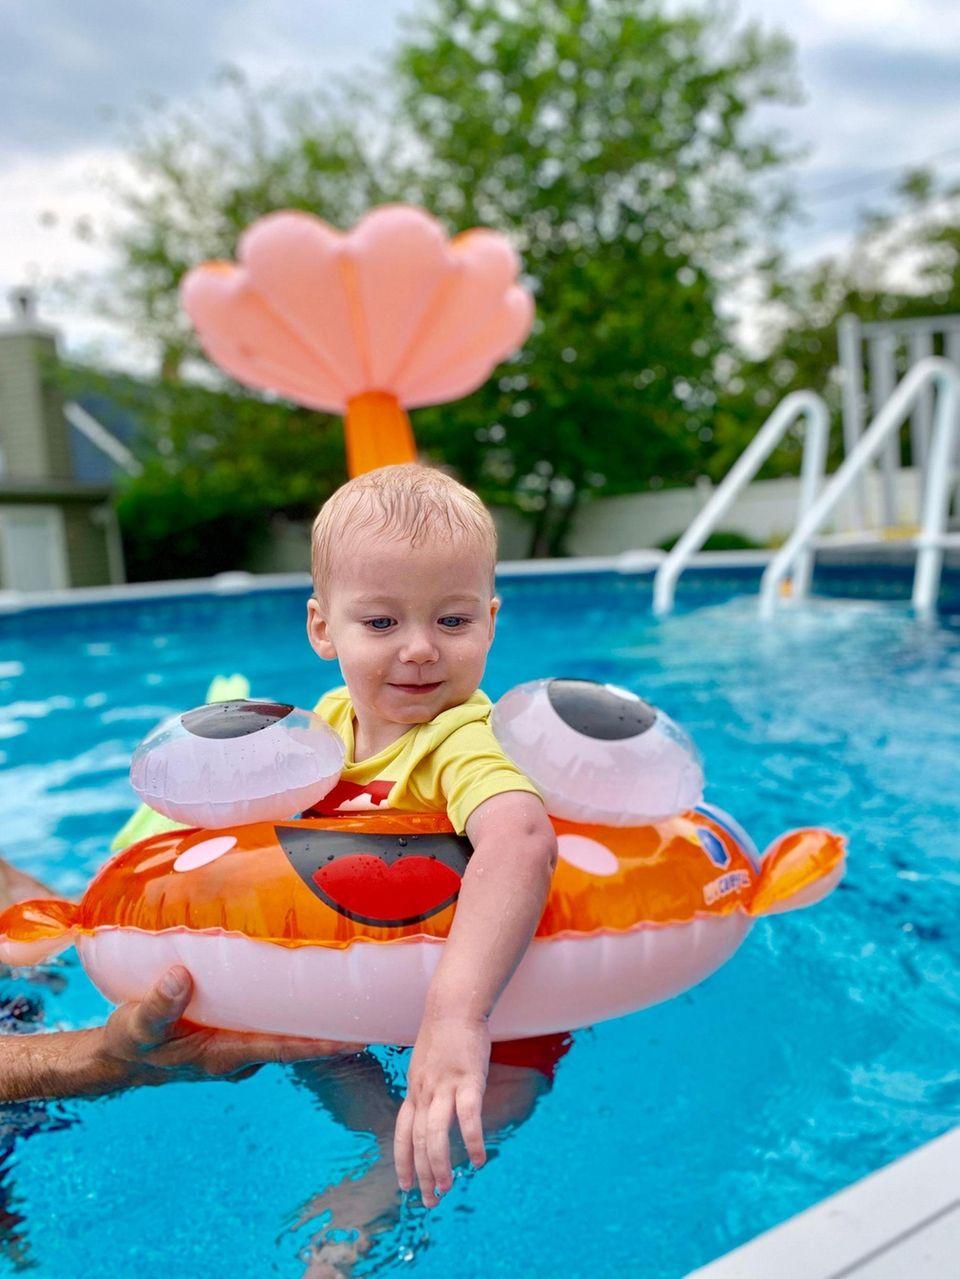 Landon Wider, 1, enjoys floating in a pool